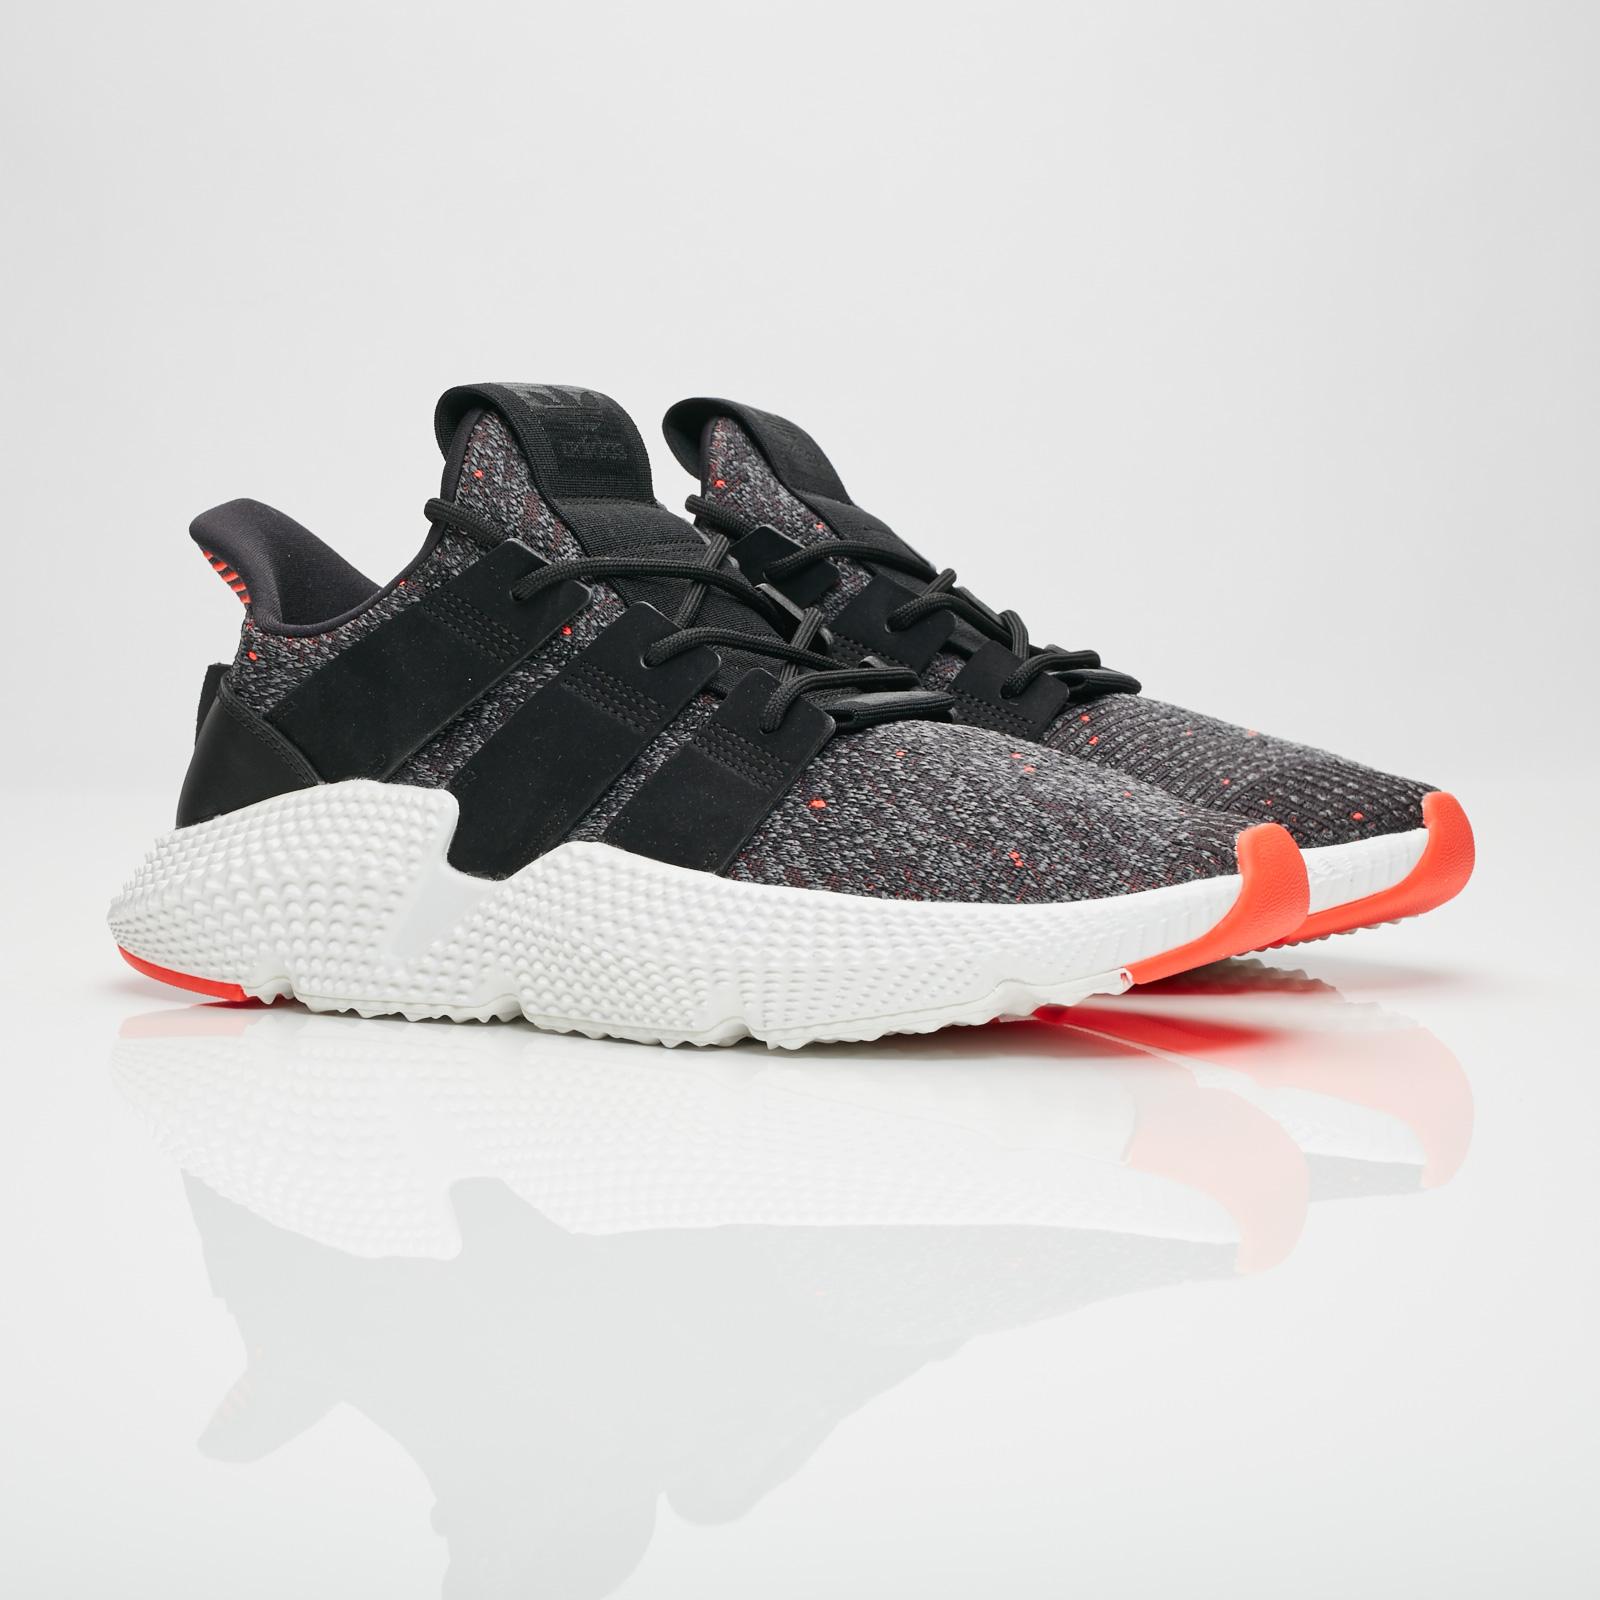 f683814d0ae adidas Prophere - Cq3022 - Sneakersnstuff   sneakers & streetwear på ...